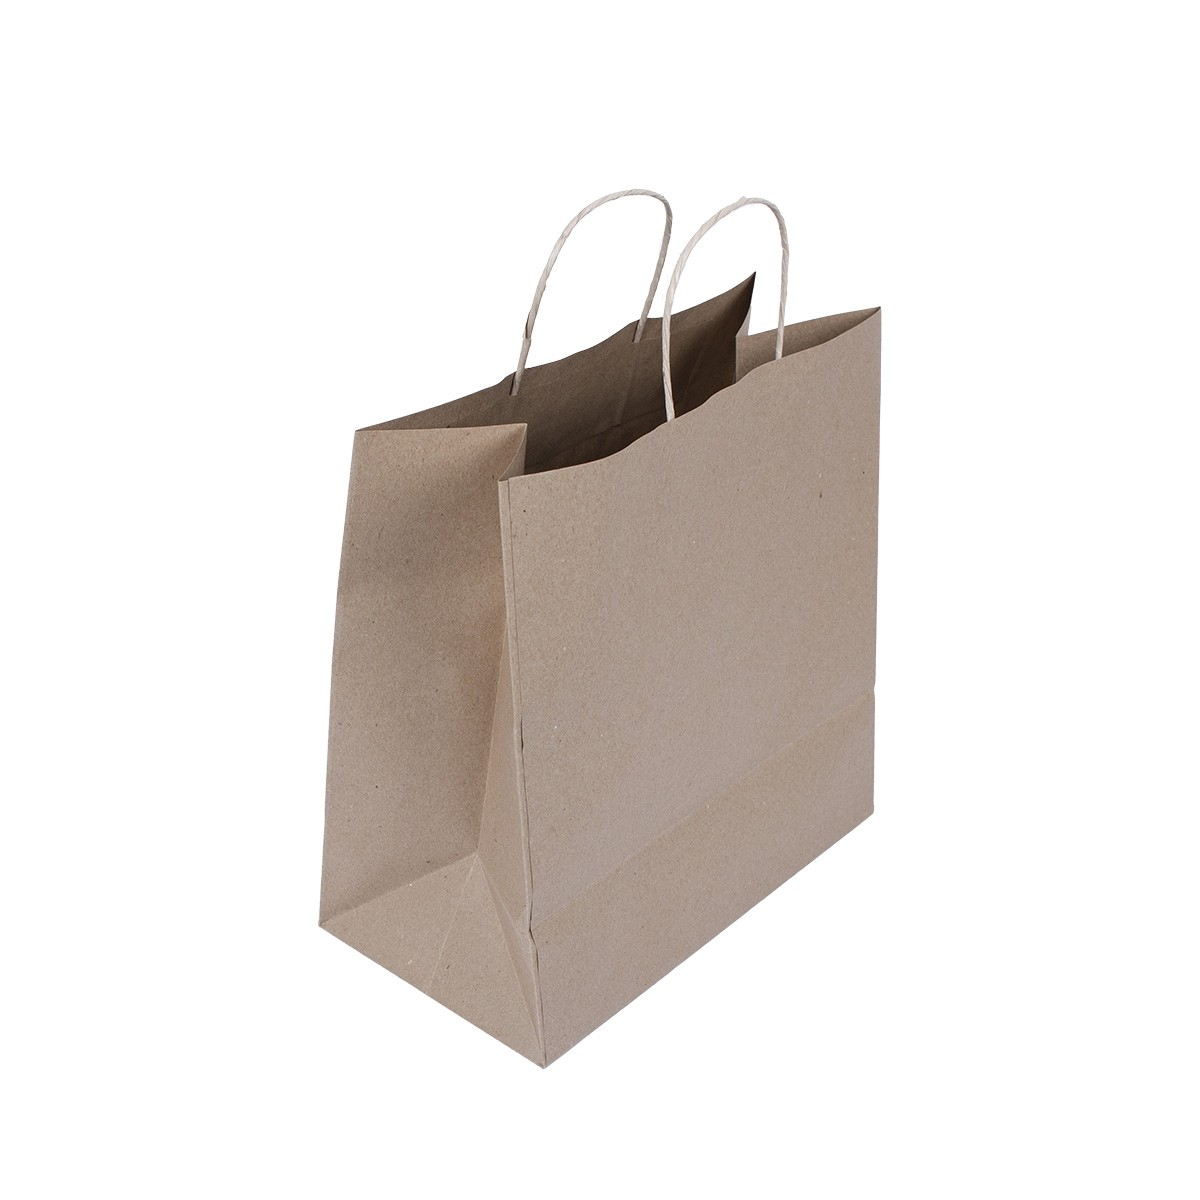 Brown Carry Bag w/ Twisted Handle 29x29+12cm Plain 100gsm- Medium | 250pcs